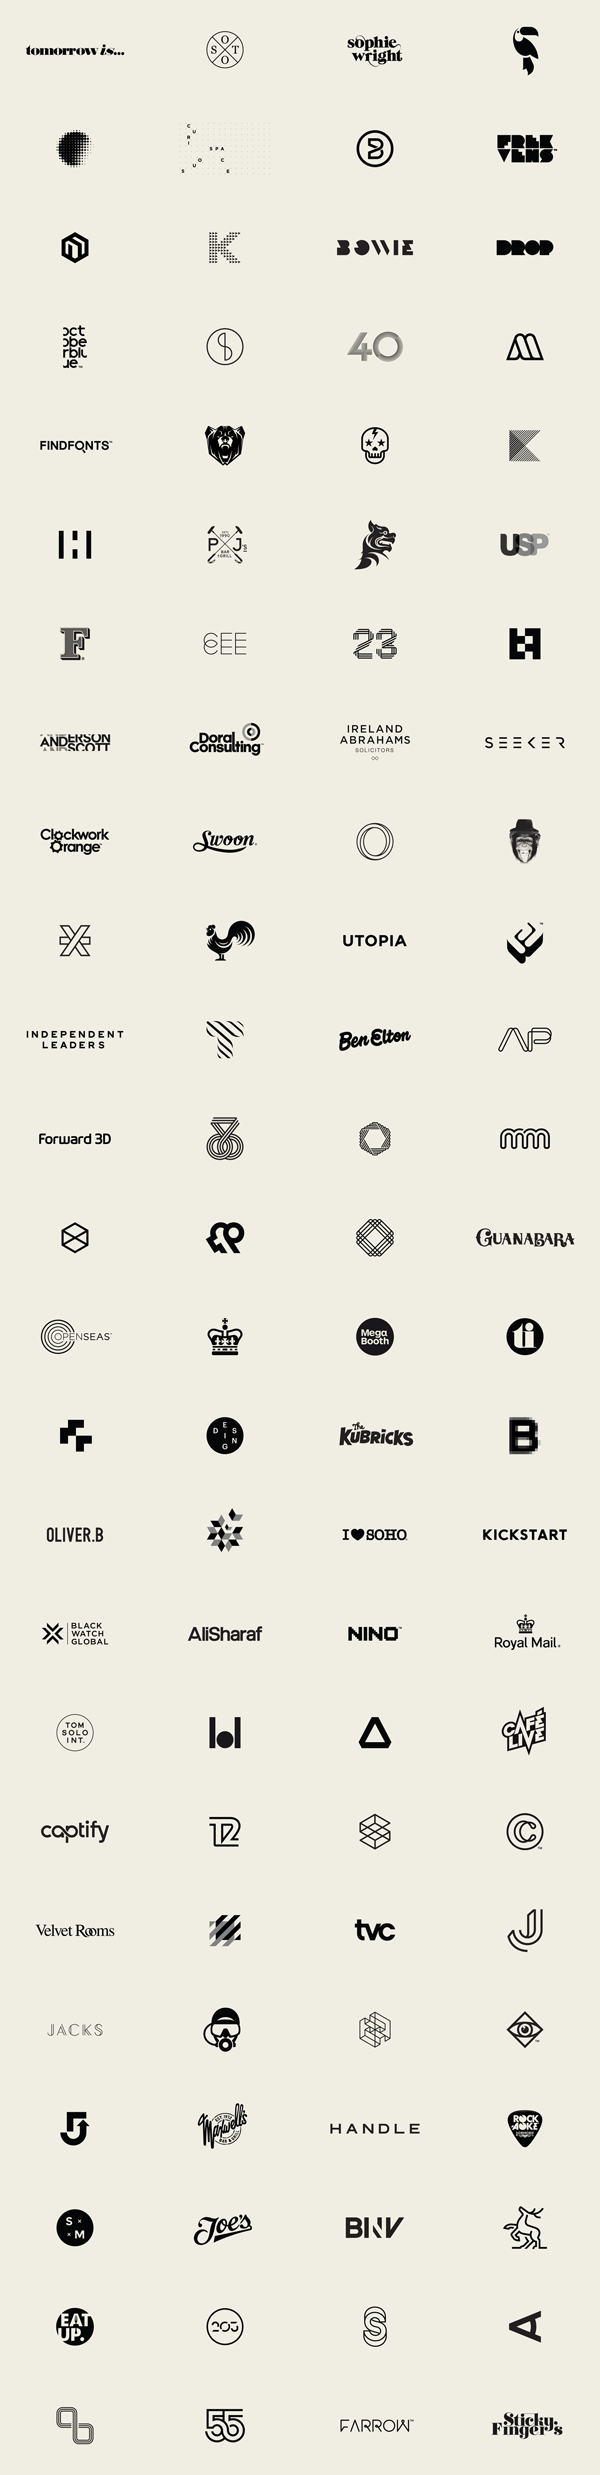 100 Logos by Mash Creative